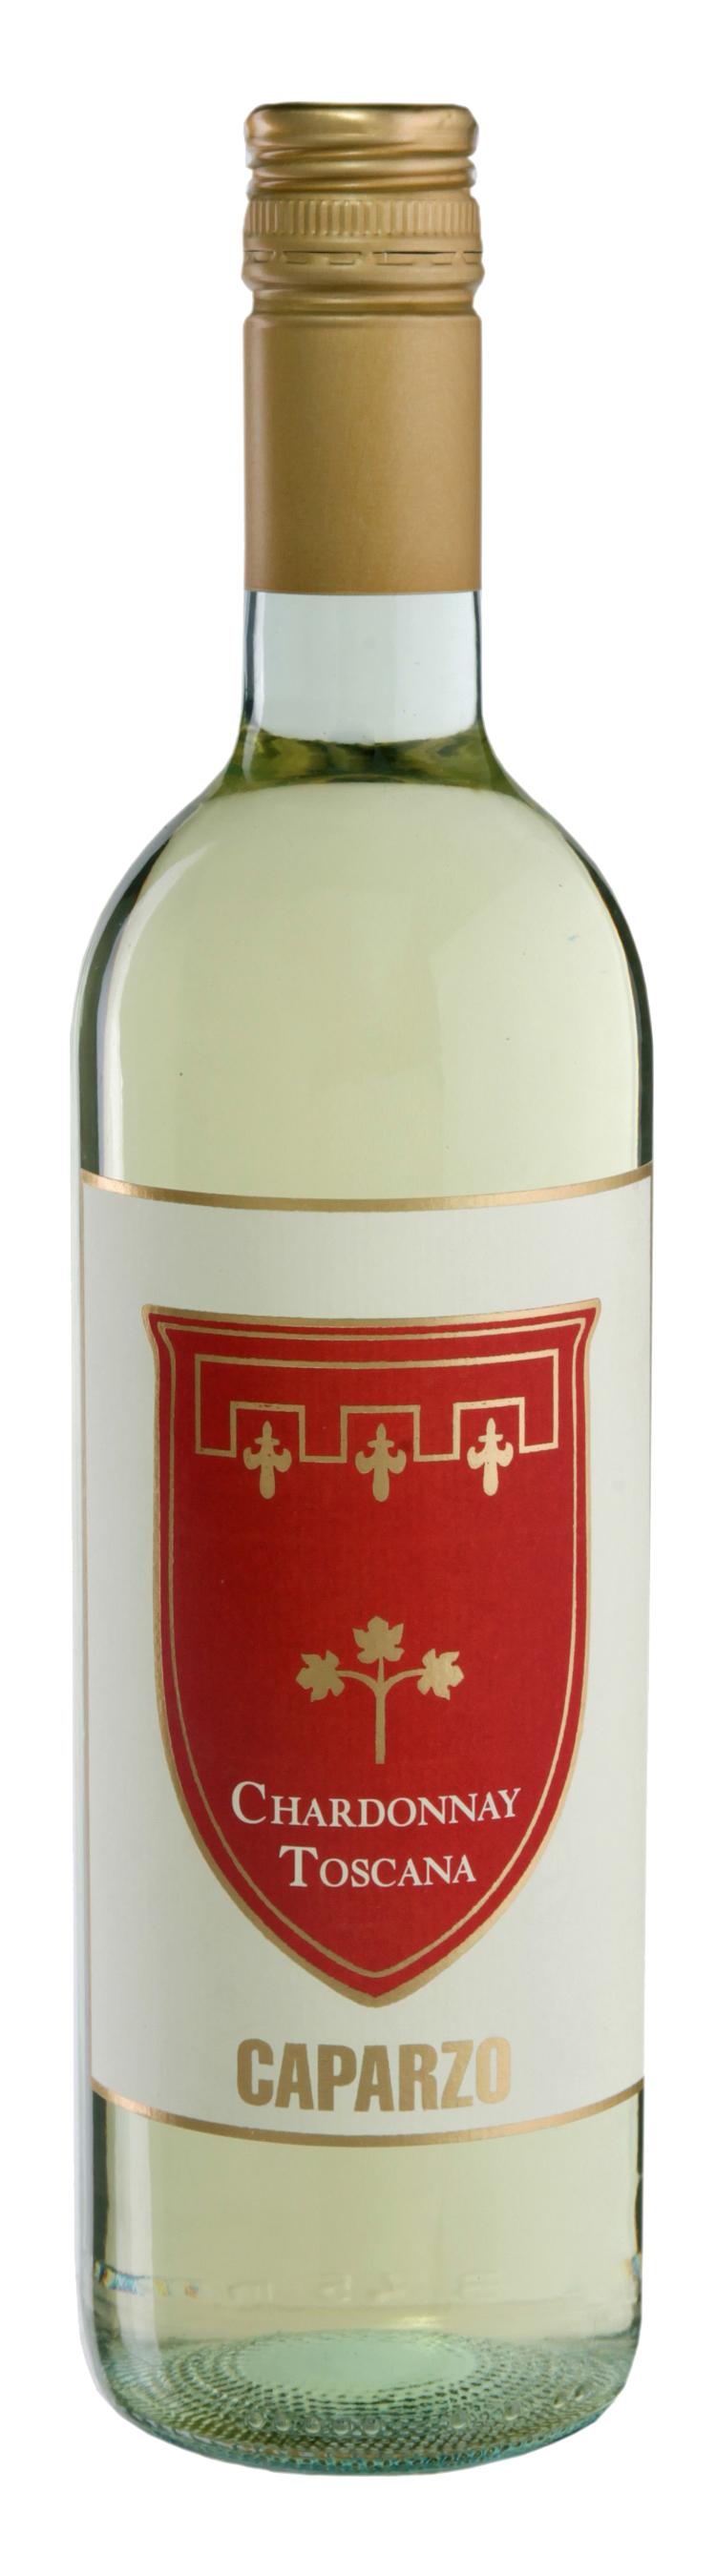 Caparzo Chardonnay Toscana Vins